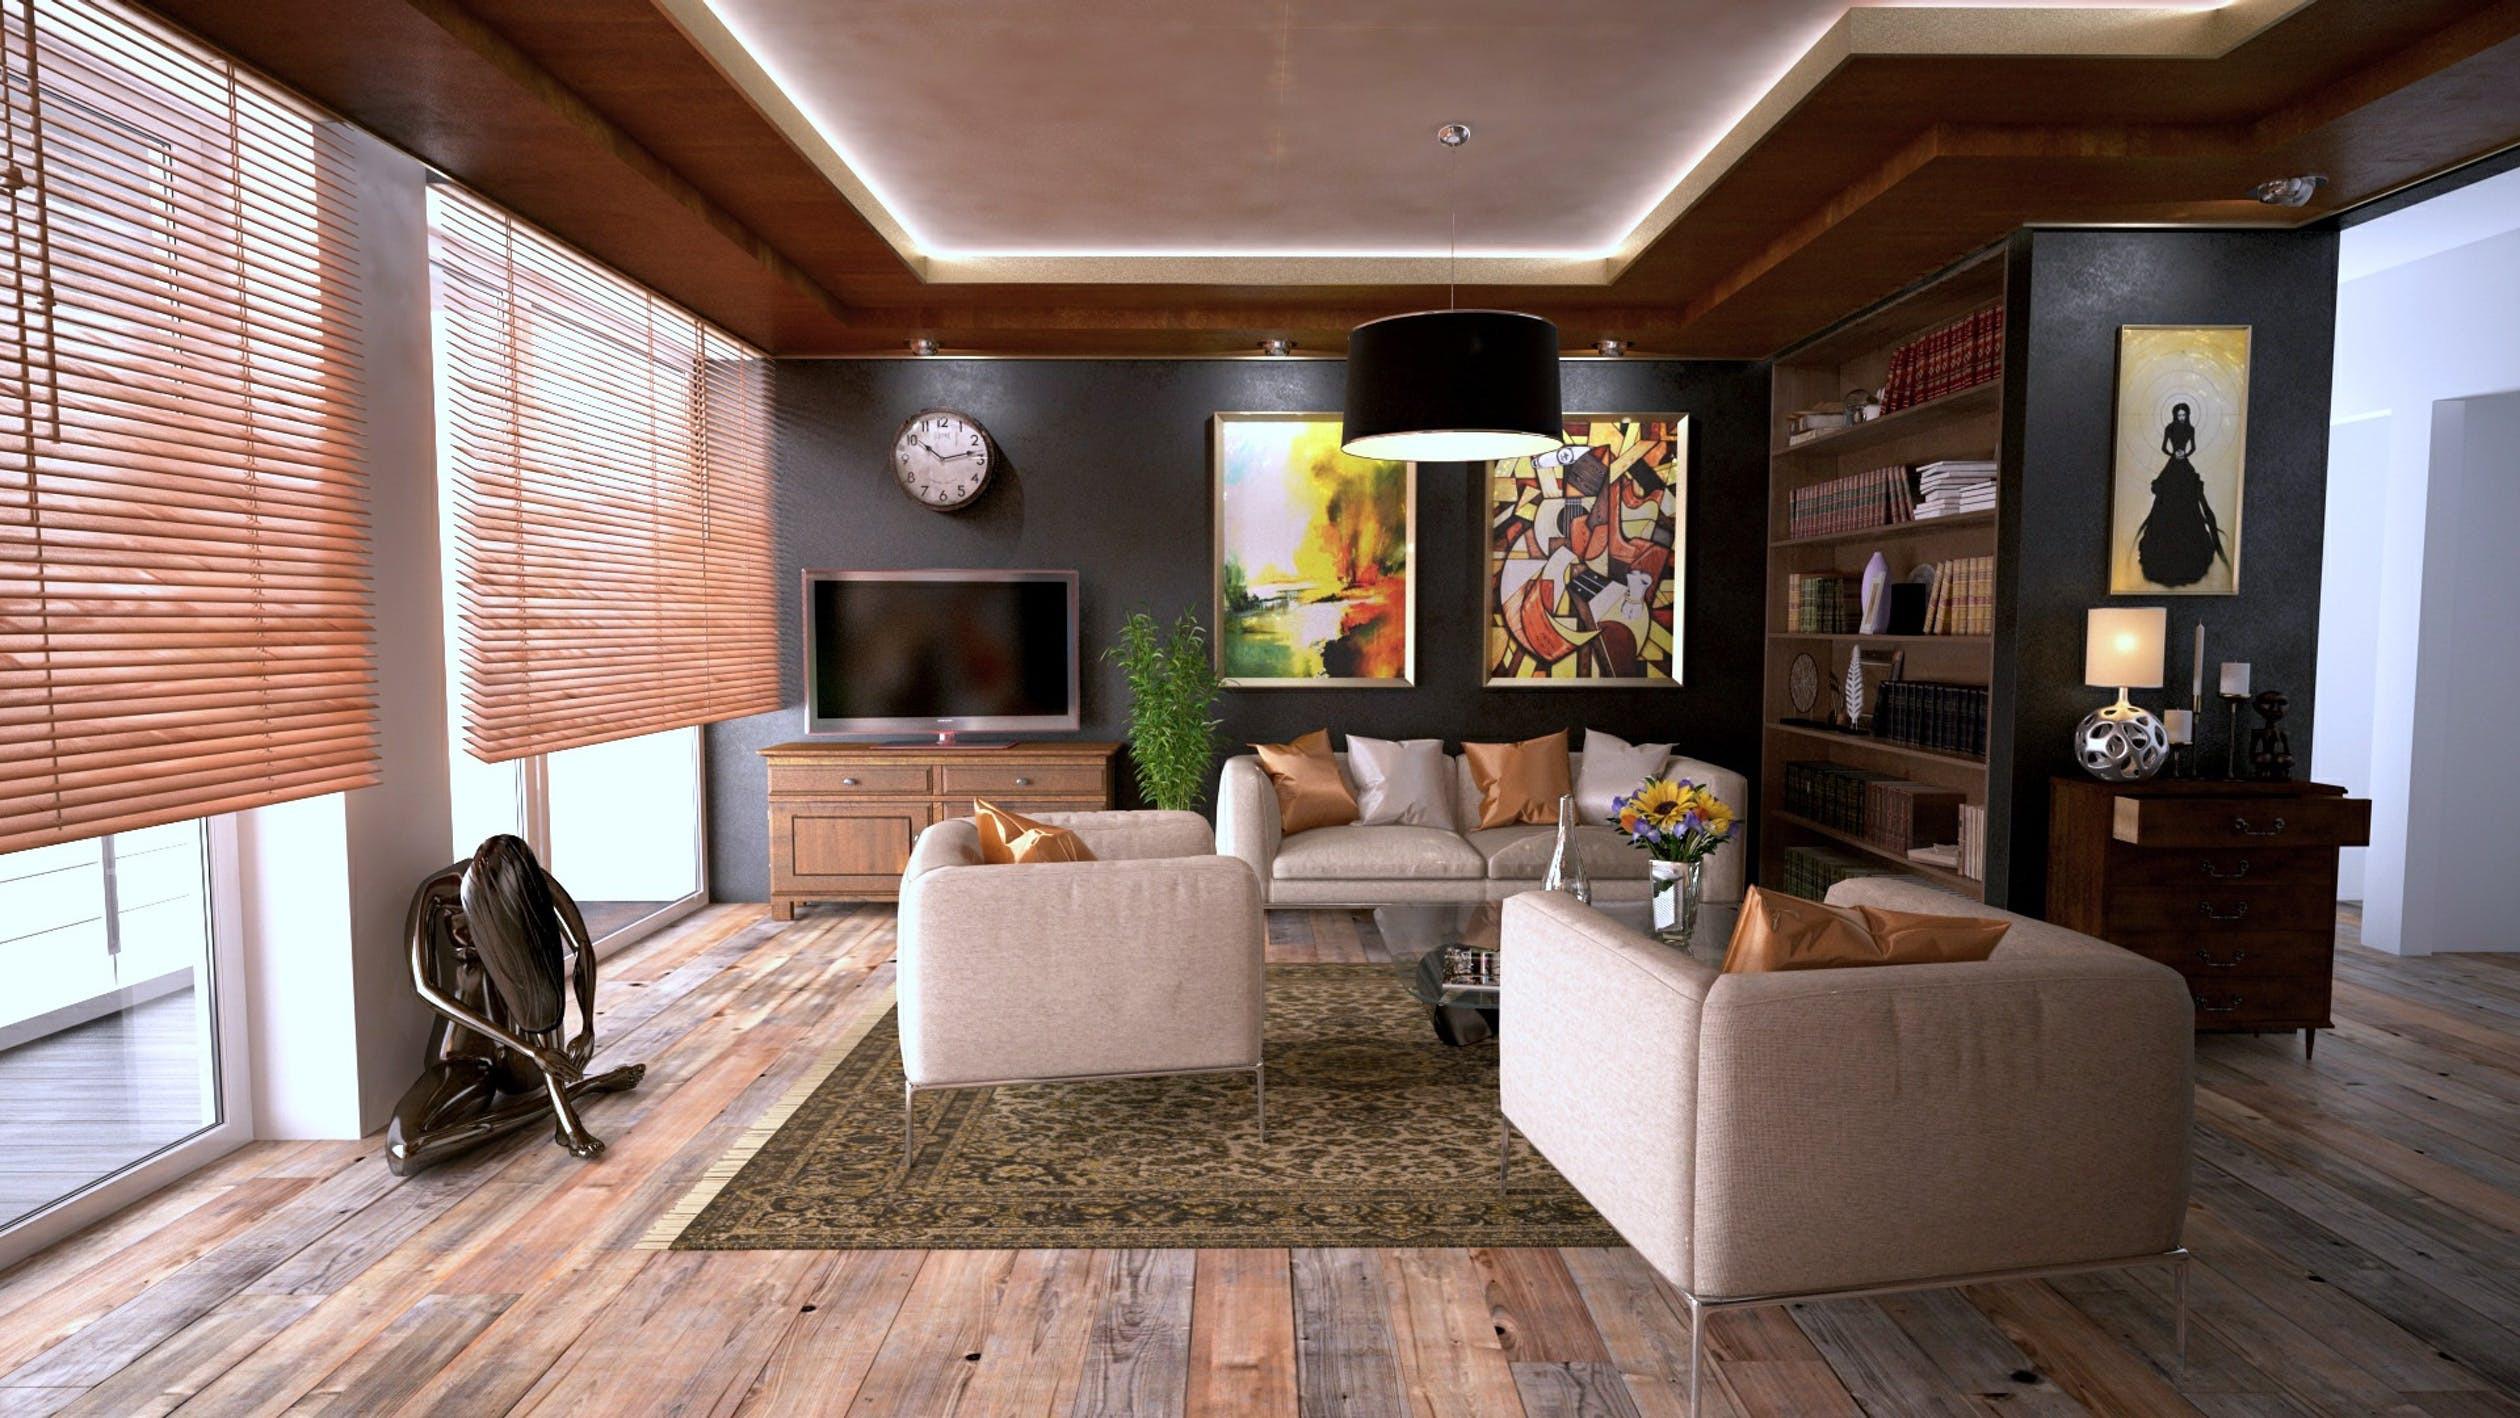 hardwood floor refinishing frederick md of maryland flooring danzco hardwood flooring call now 443 380 2155 with hardwood flooring